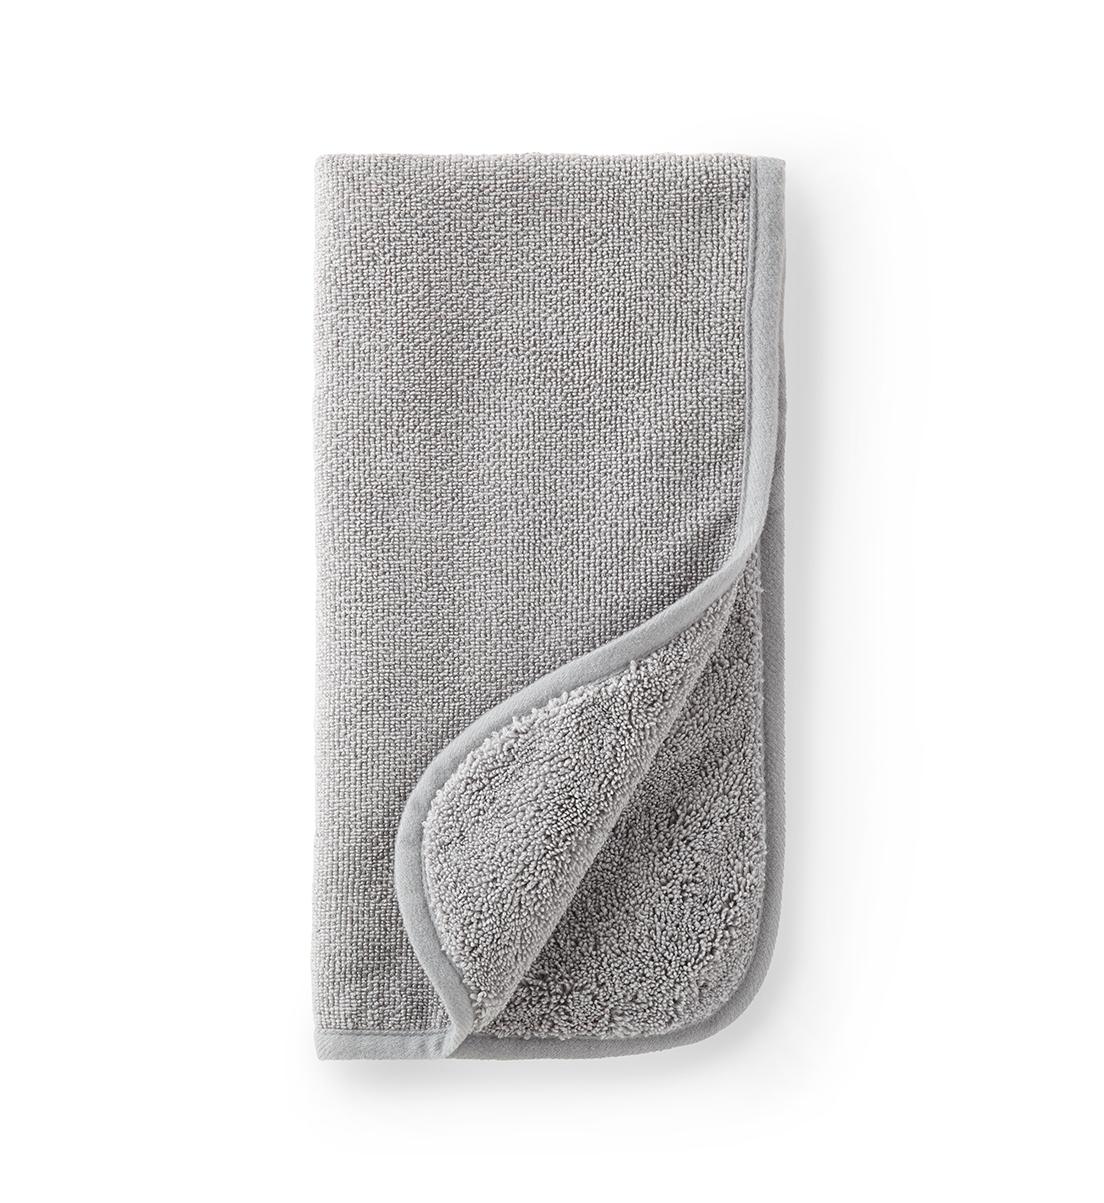 Ultra-Plush Hand Towel, graphite